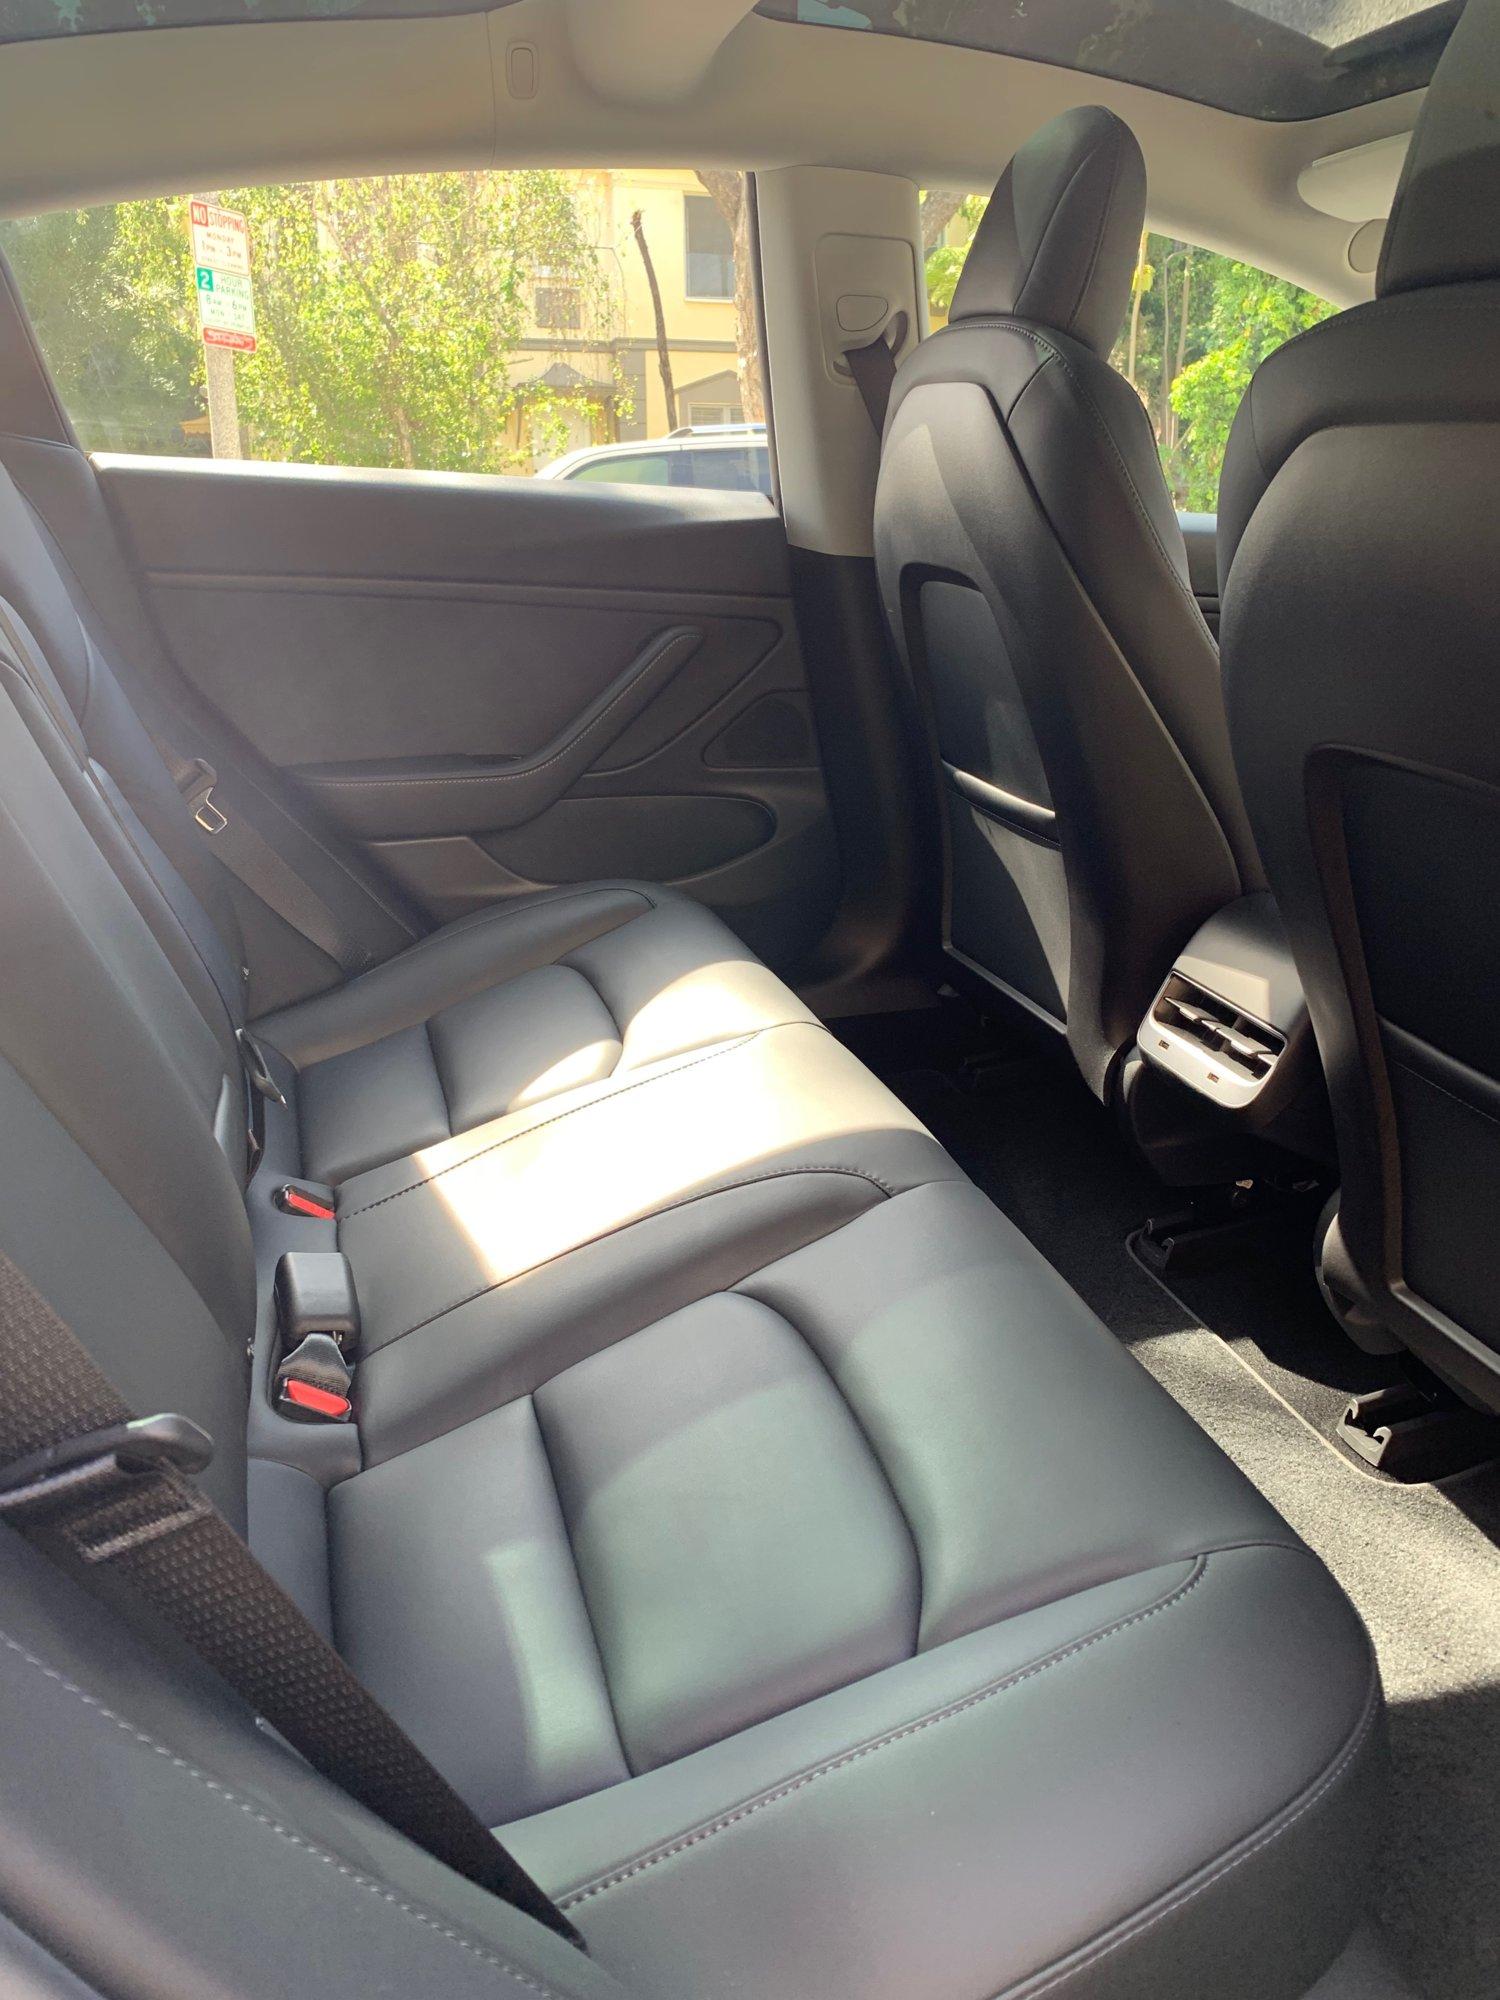 back seats.jpg